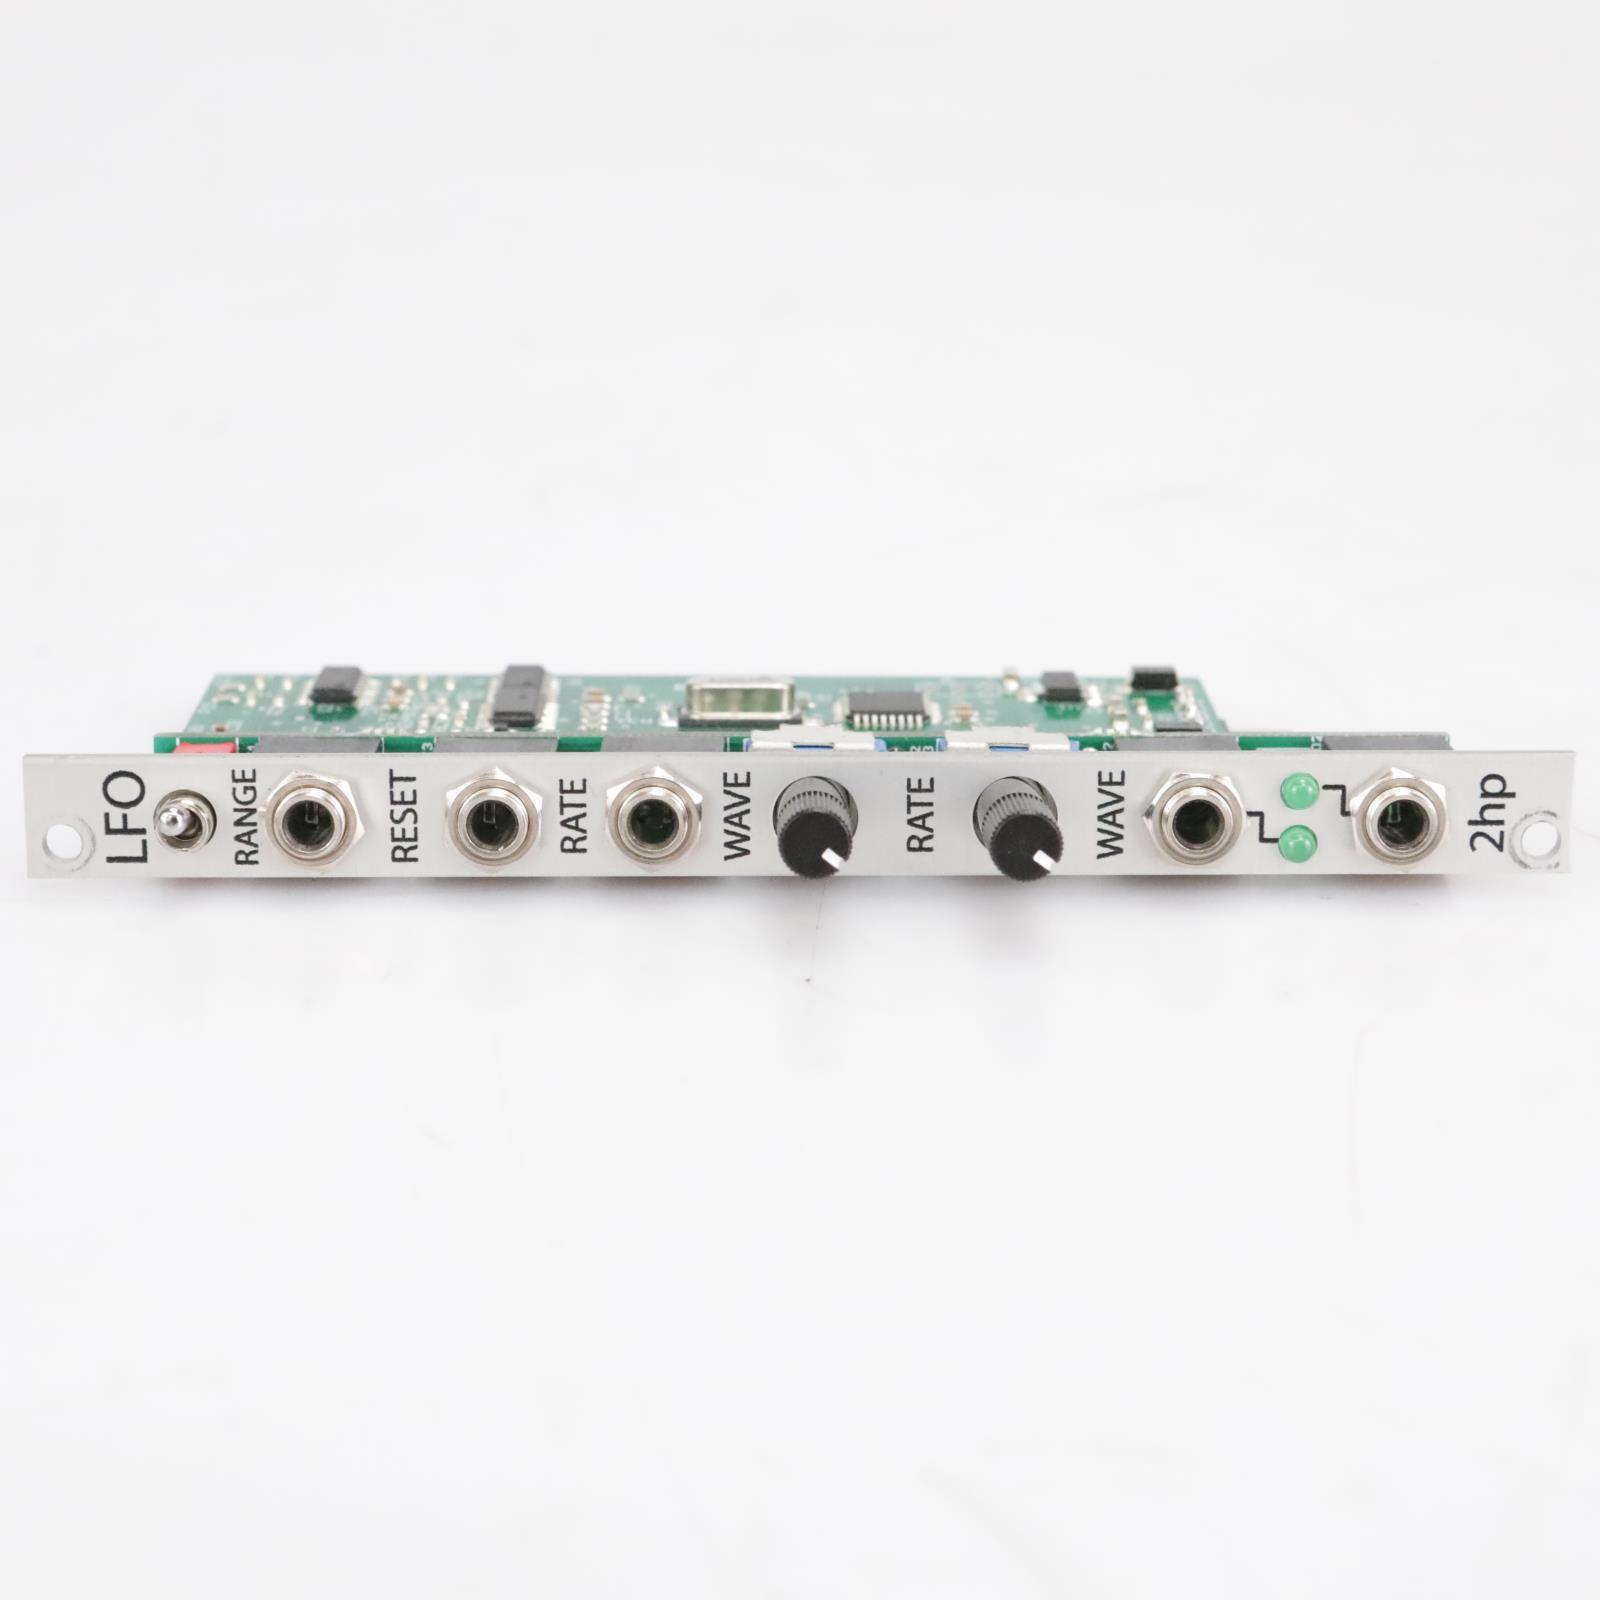 2HP LFO V2 Eurorack Module #41858